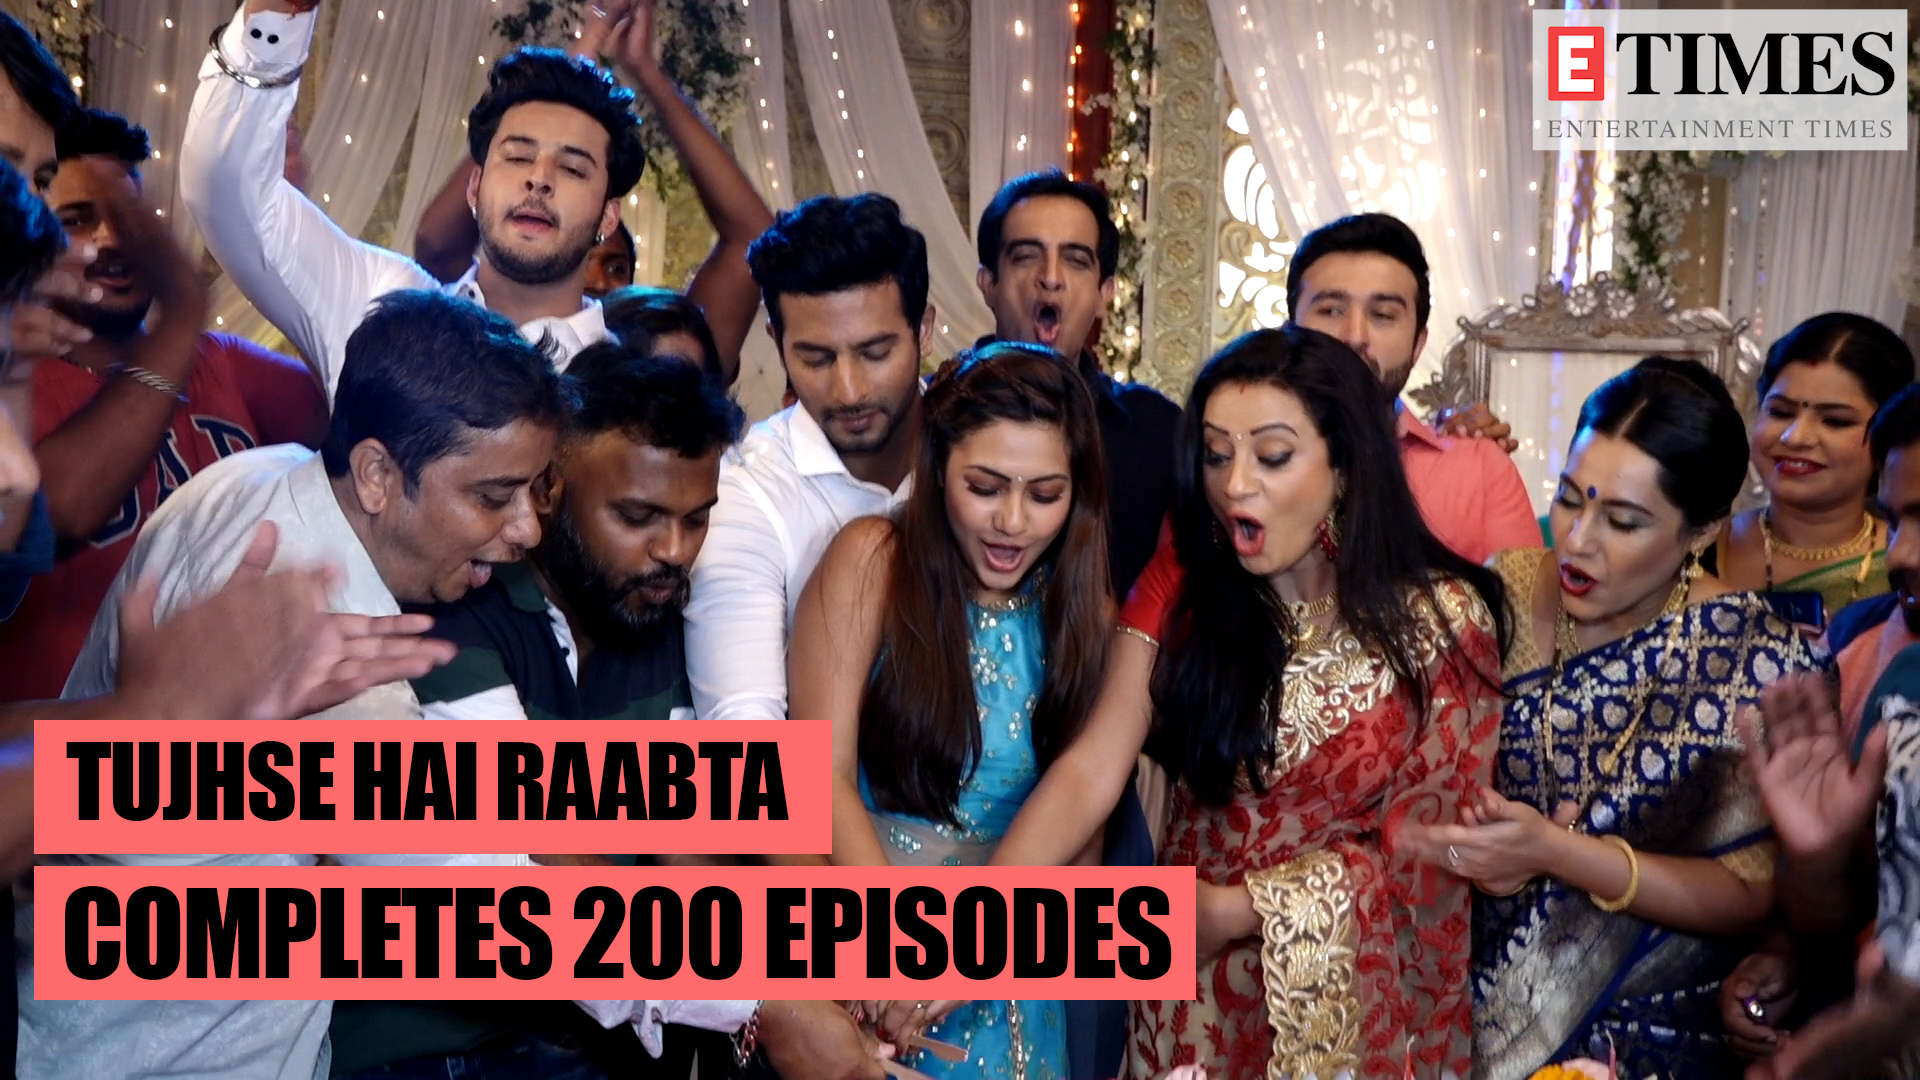 Tujhse Hai Raabta completes 200 episodes, team celebrates their success